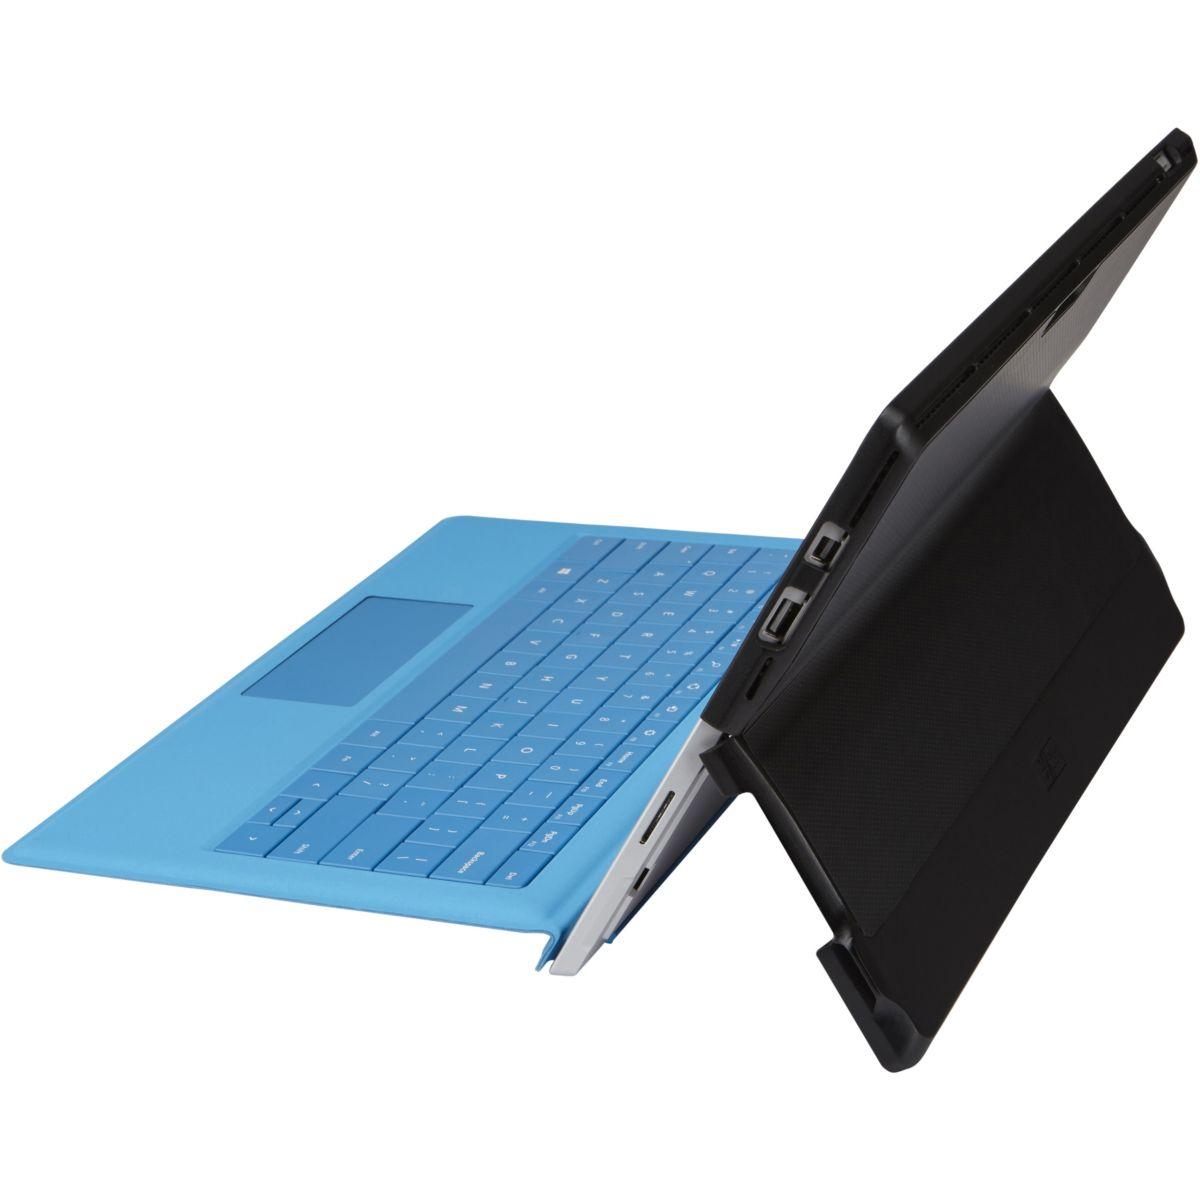 Folio caselogic microsoft surface pro 3 - 20% de remise immédiate avec le code : multi20 (photo)